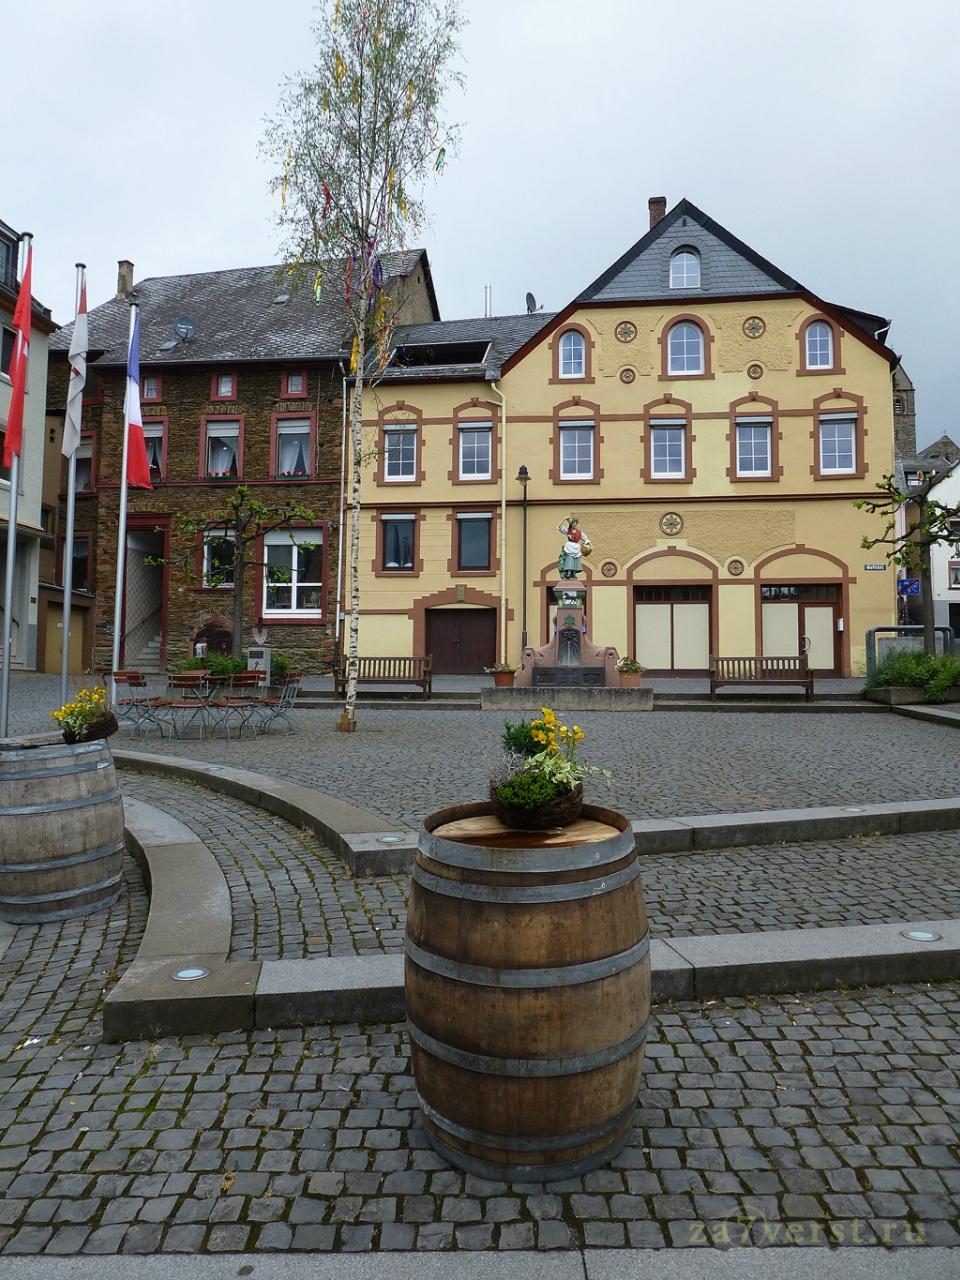 Трабен-Трарбах, Германия